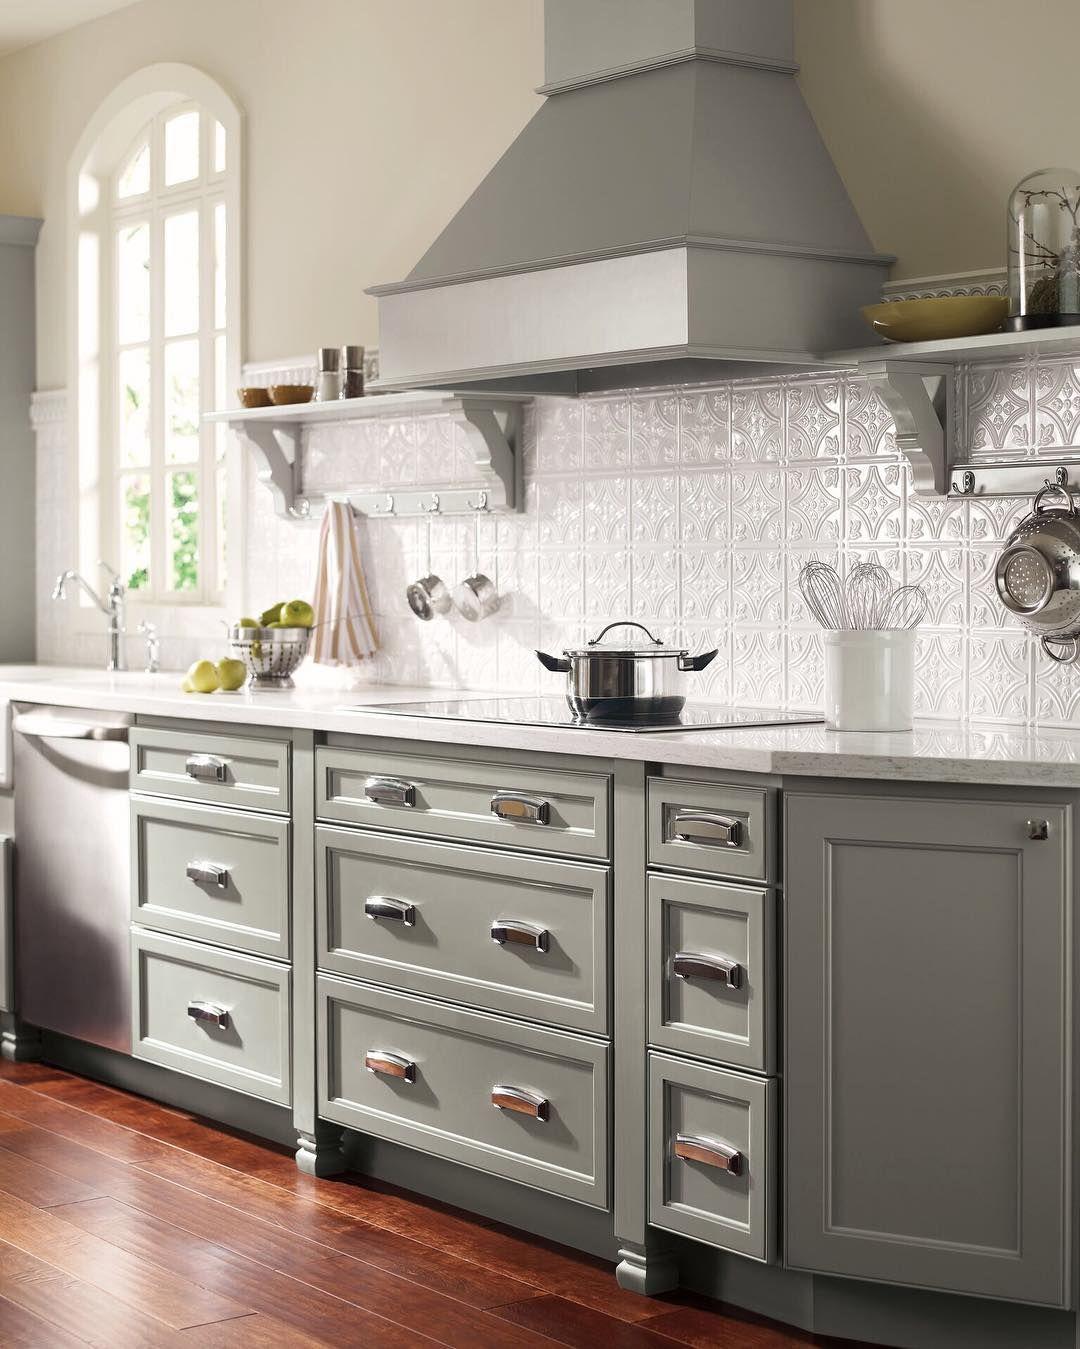 Loving This Color Scheme Simslohman Homecrest Masterbrands Kitchendesign Kitchenremodel In 2020